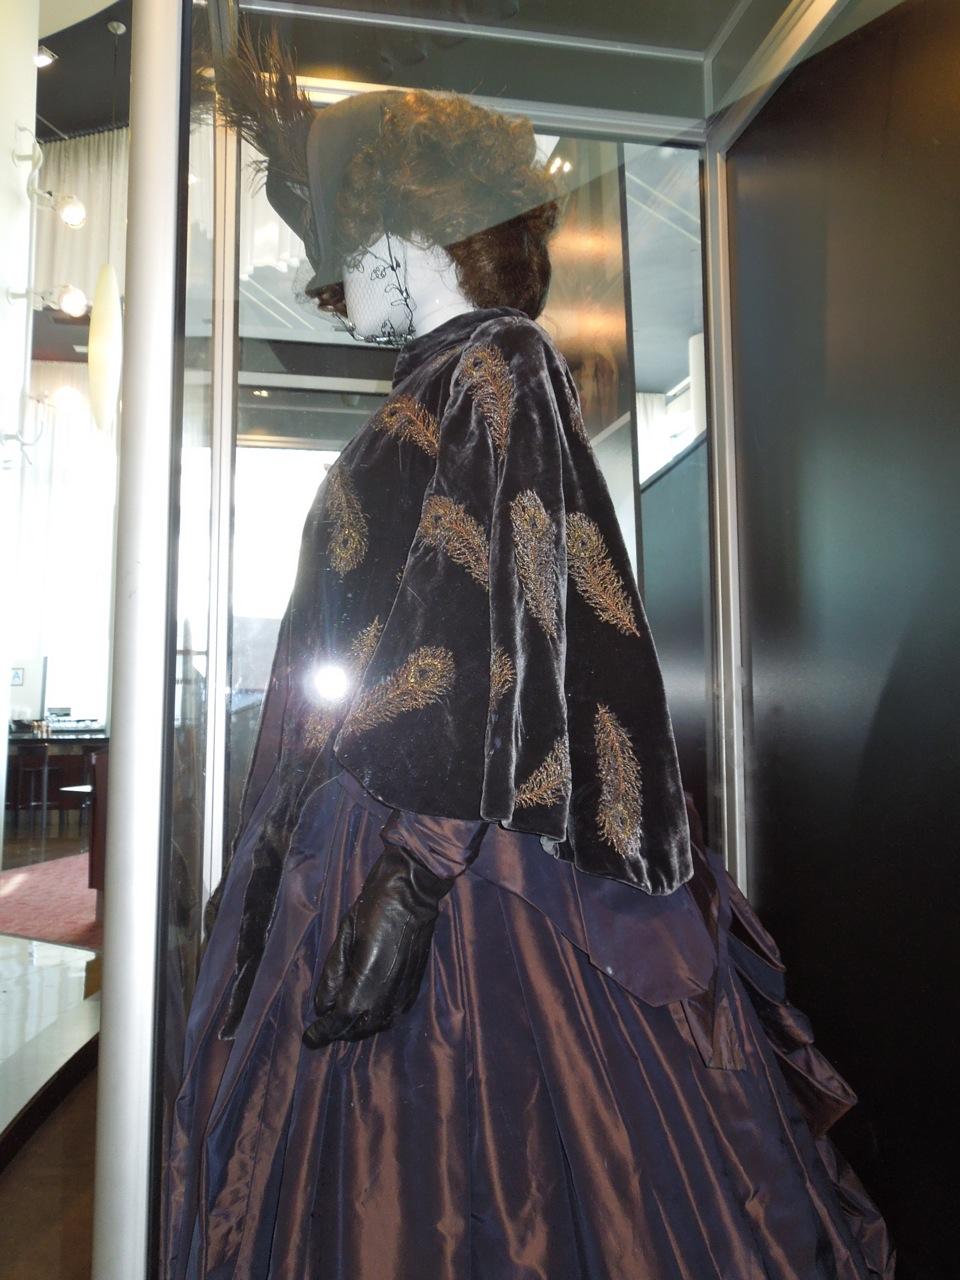 Hollywood Movie Costumes and Props: November 2012 Original ...